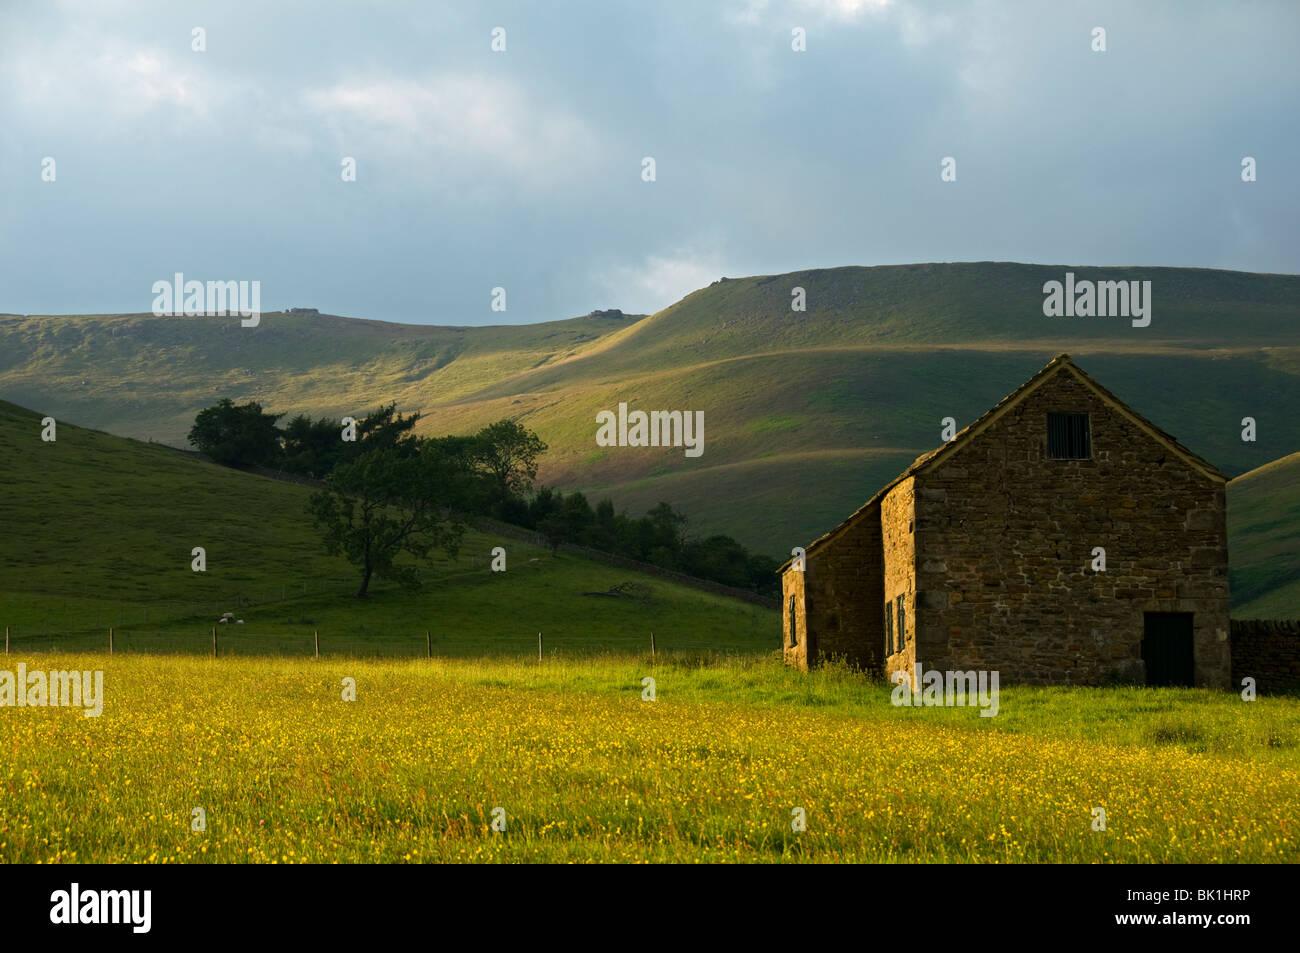 Barn below the Kinder Scout plateau, Edale, Peak District, Derbyshire, England, UK - Stock Image